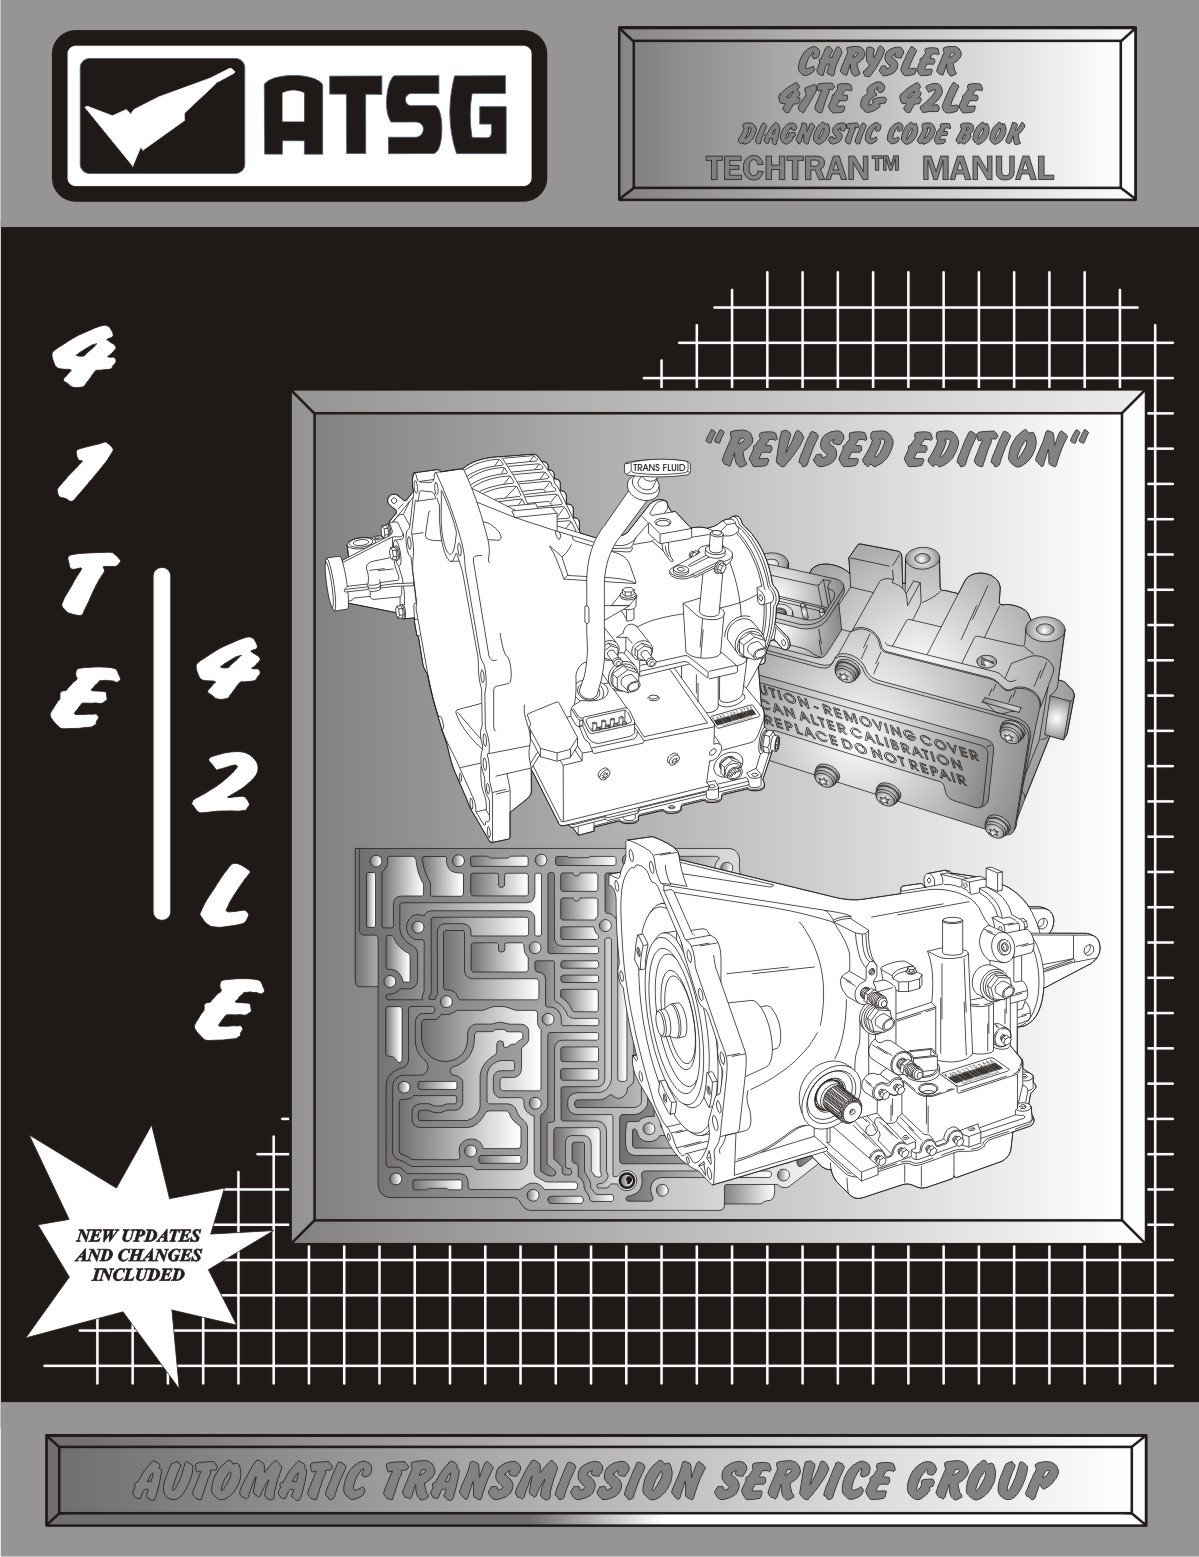 Download Chrysler, Dodge, Mitsubishi 41TE (A604) / 42TE (A606) Transmission Diagnostic Code Book pdf